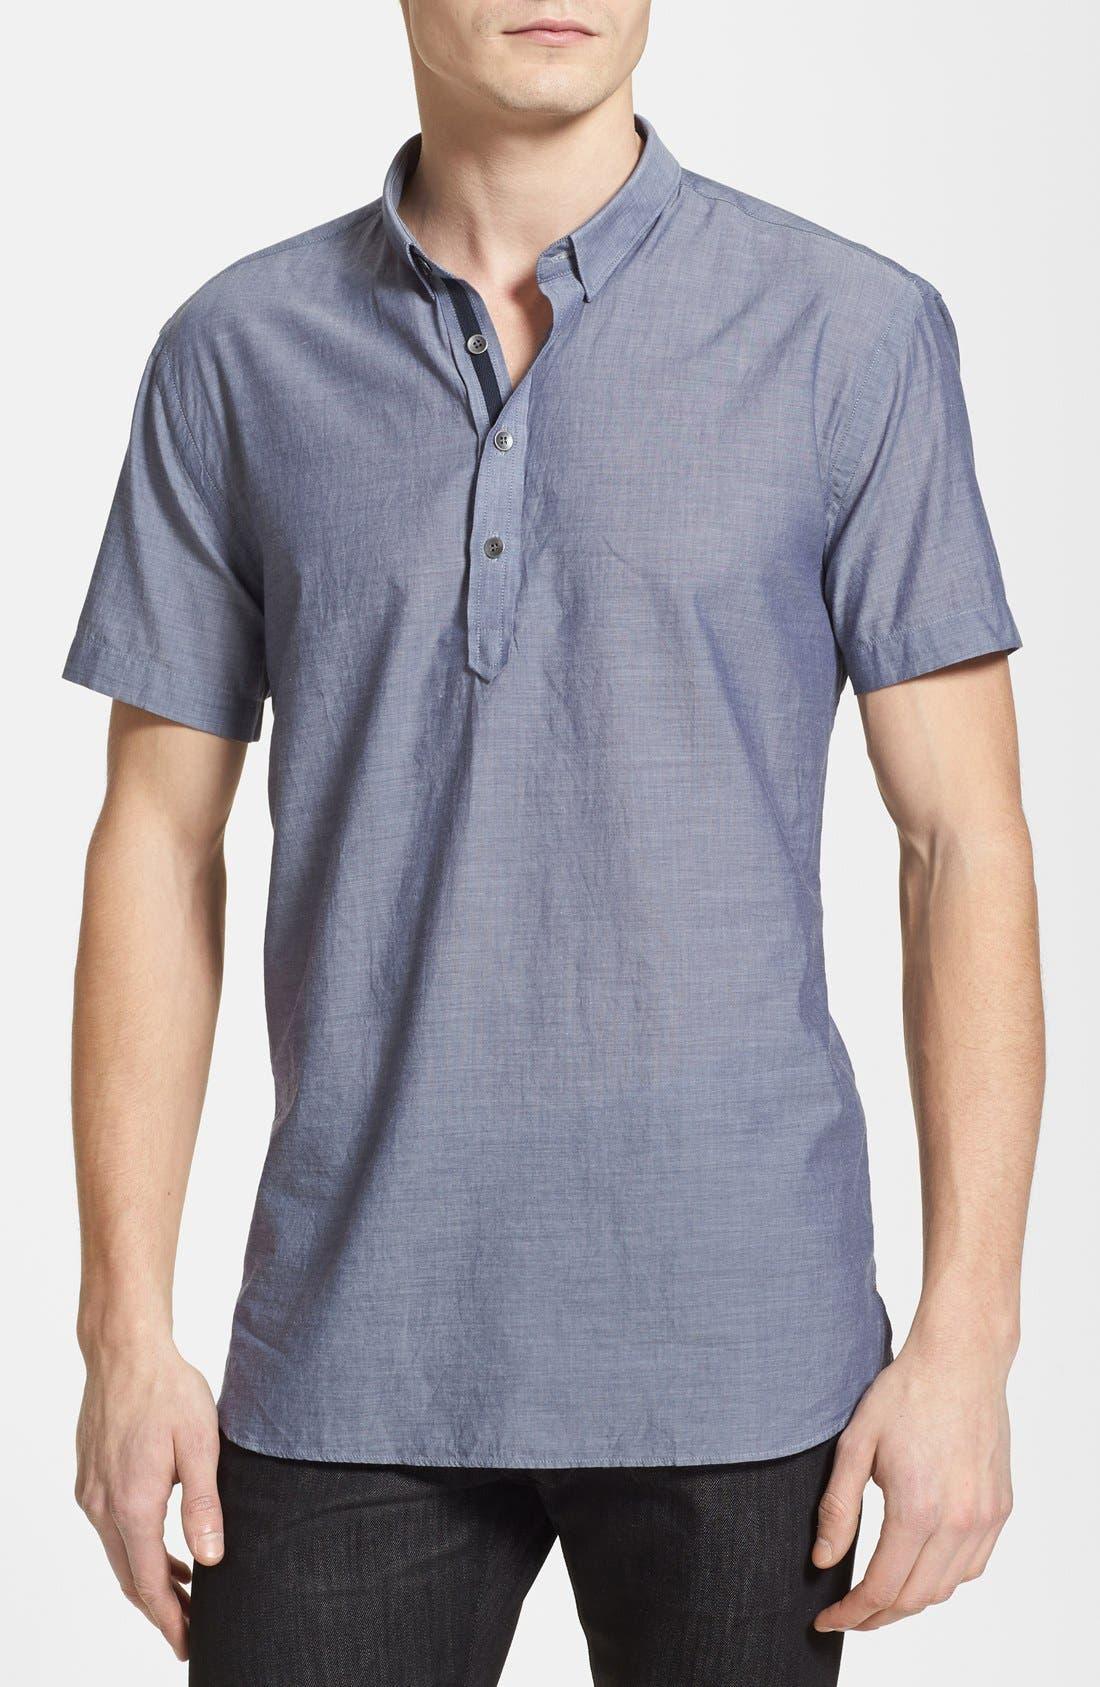 Alternate Image 1 Selected - Bespoken Slim Fit Polo Shirt